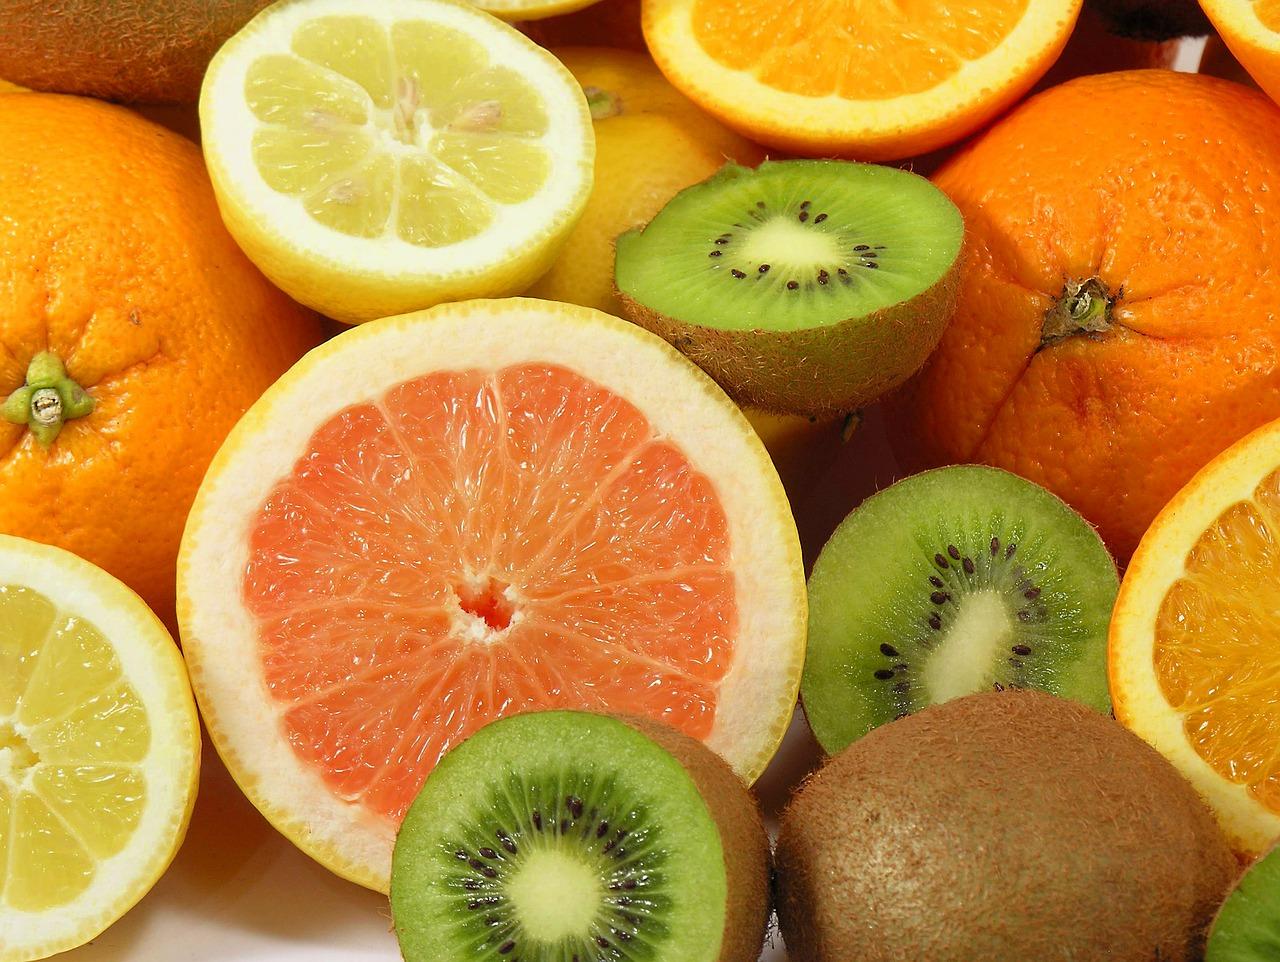 Tα σημαντικότερα διατροφικά σημεία για τους εφήβους